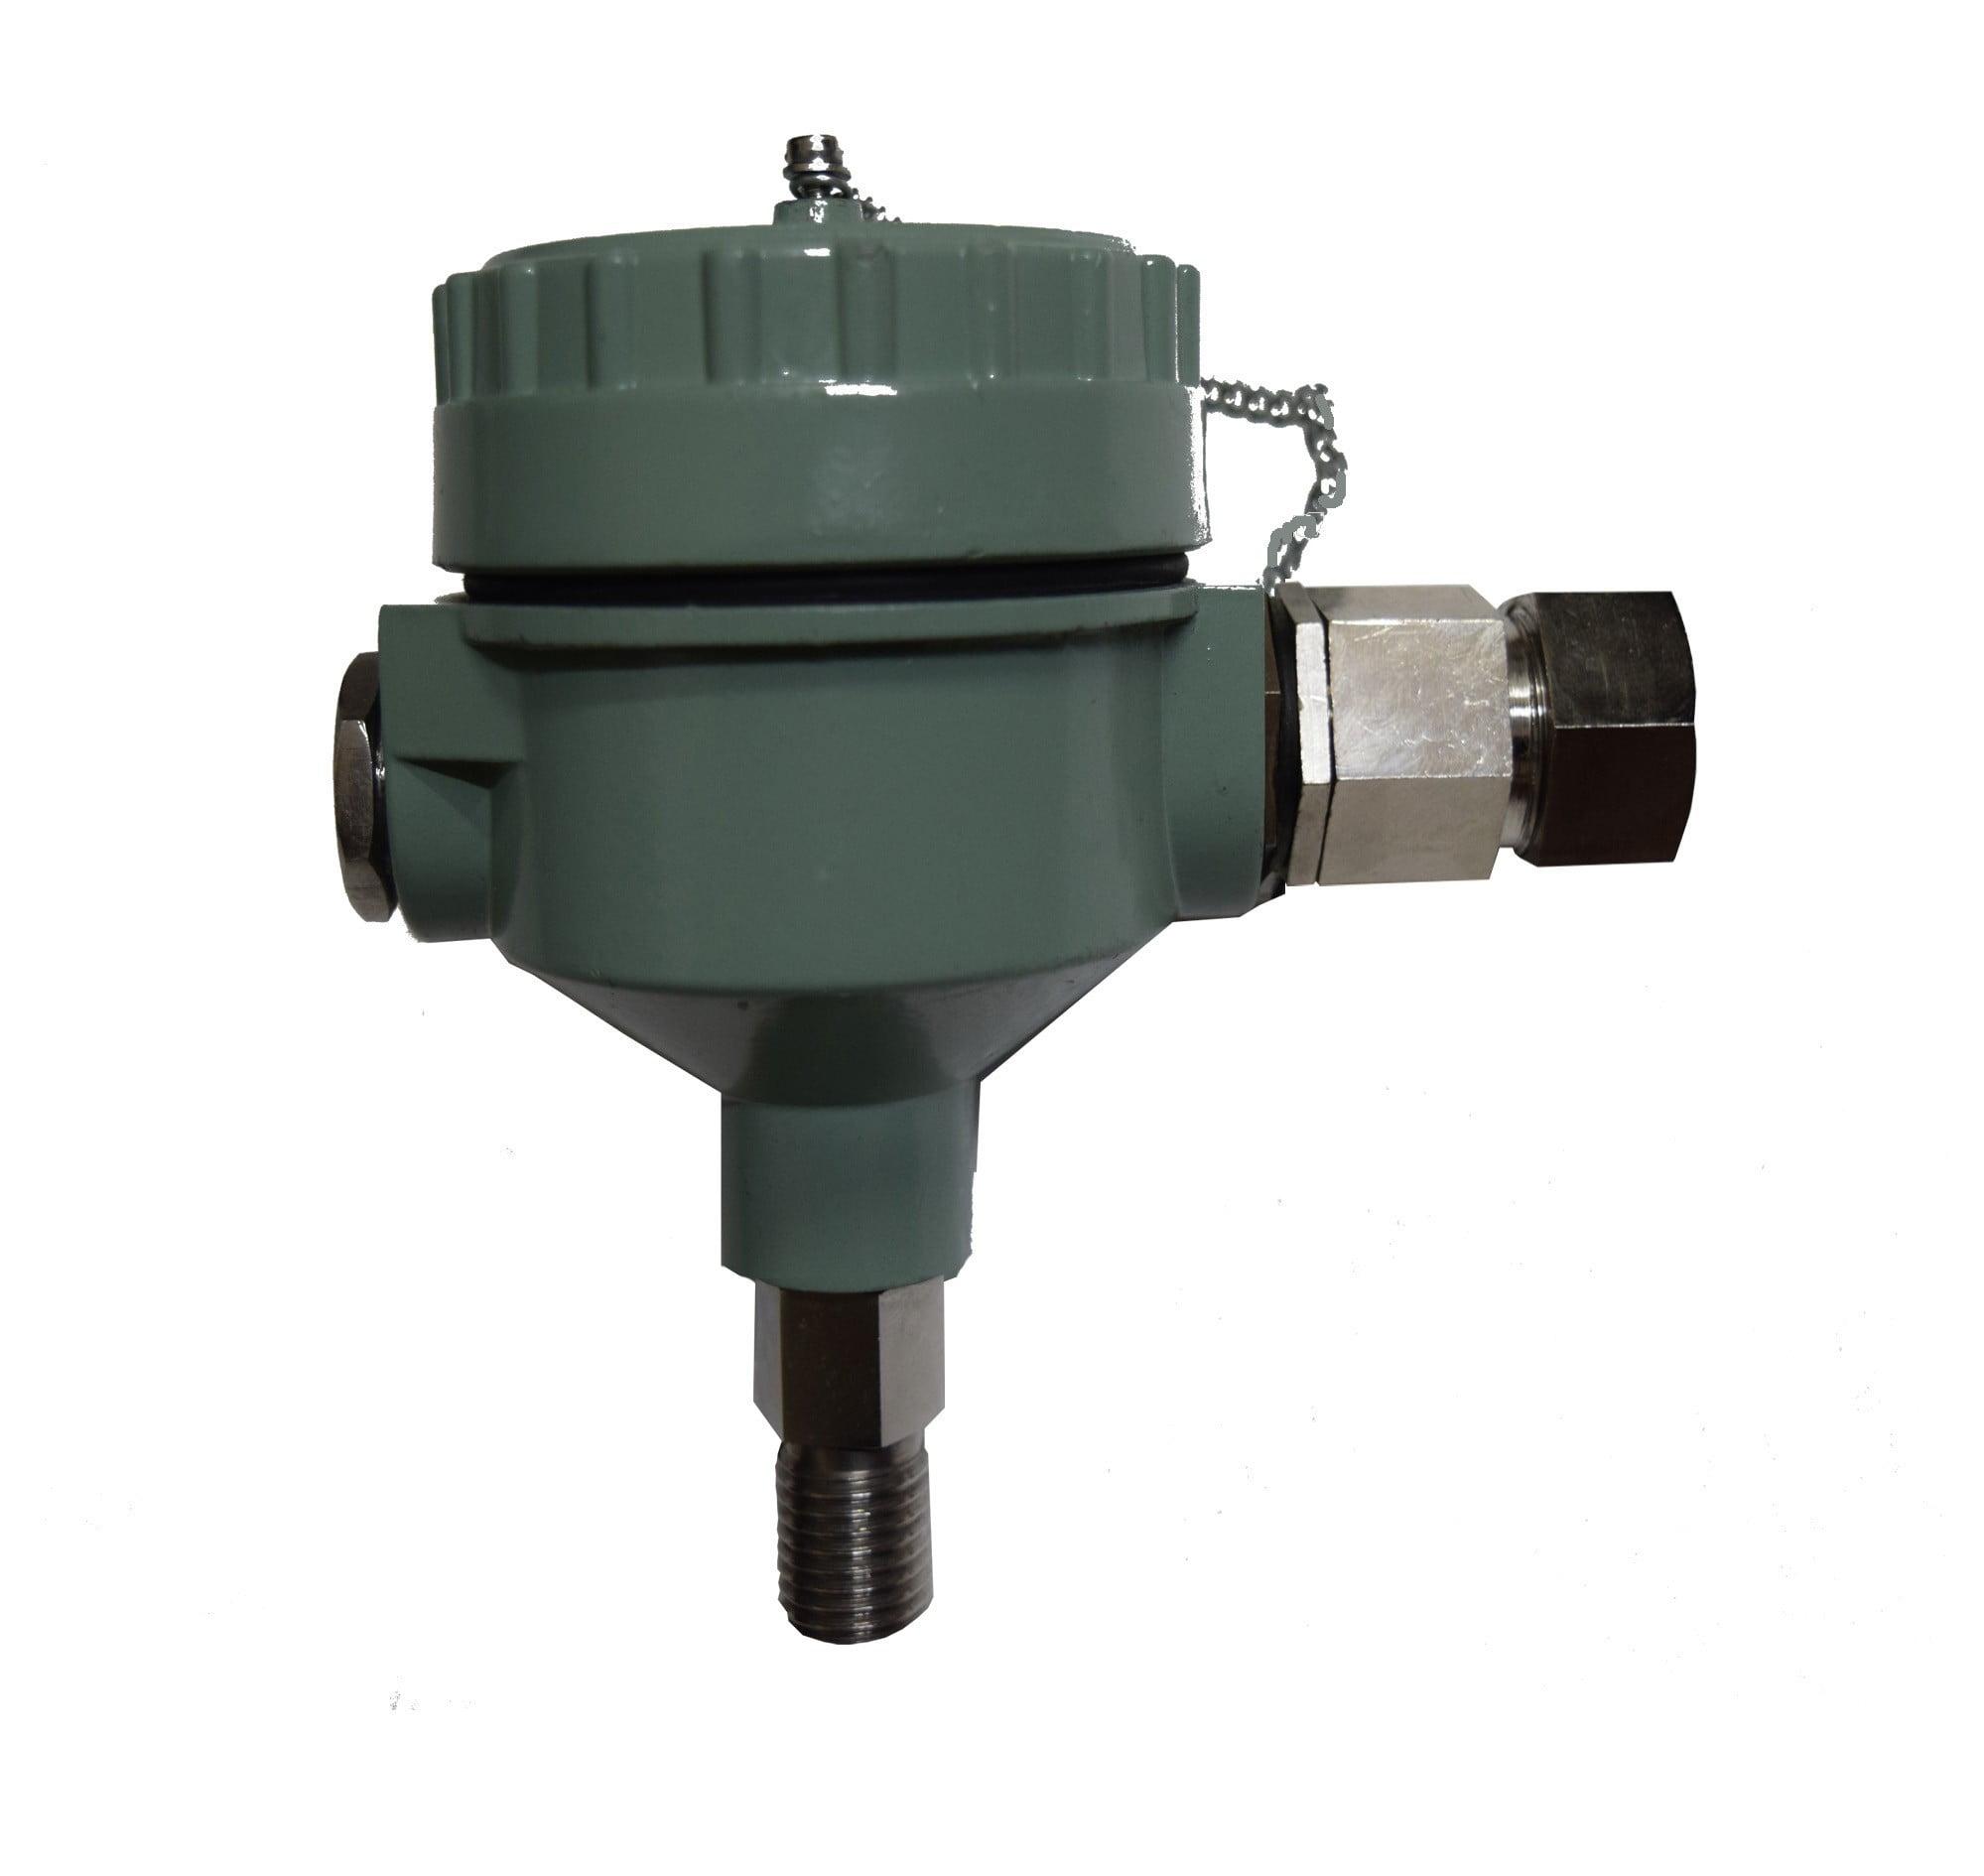 Ace instruements,Flameproof Pressure Transmitter,Pressure Transmitter,Flameproof Pressure Transmitter,Vacuum transmitter, transmitter, flame proof pressure transmitter, pressure transducer, pressure sensor